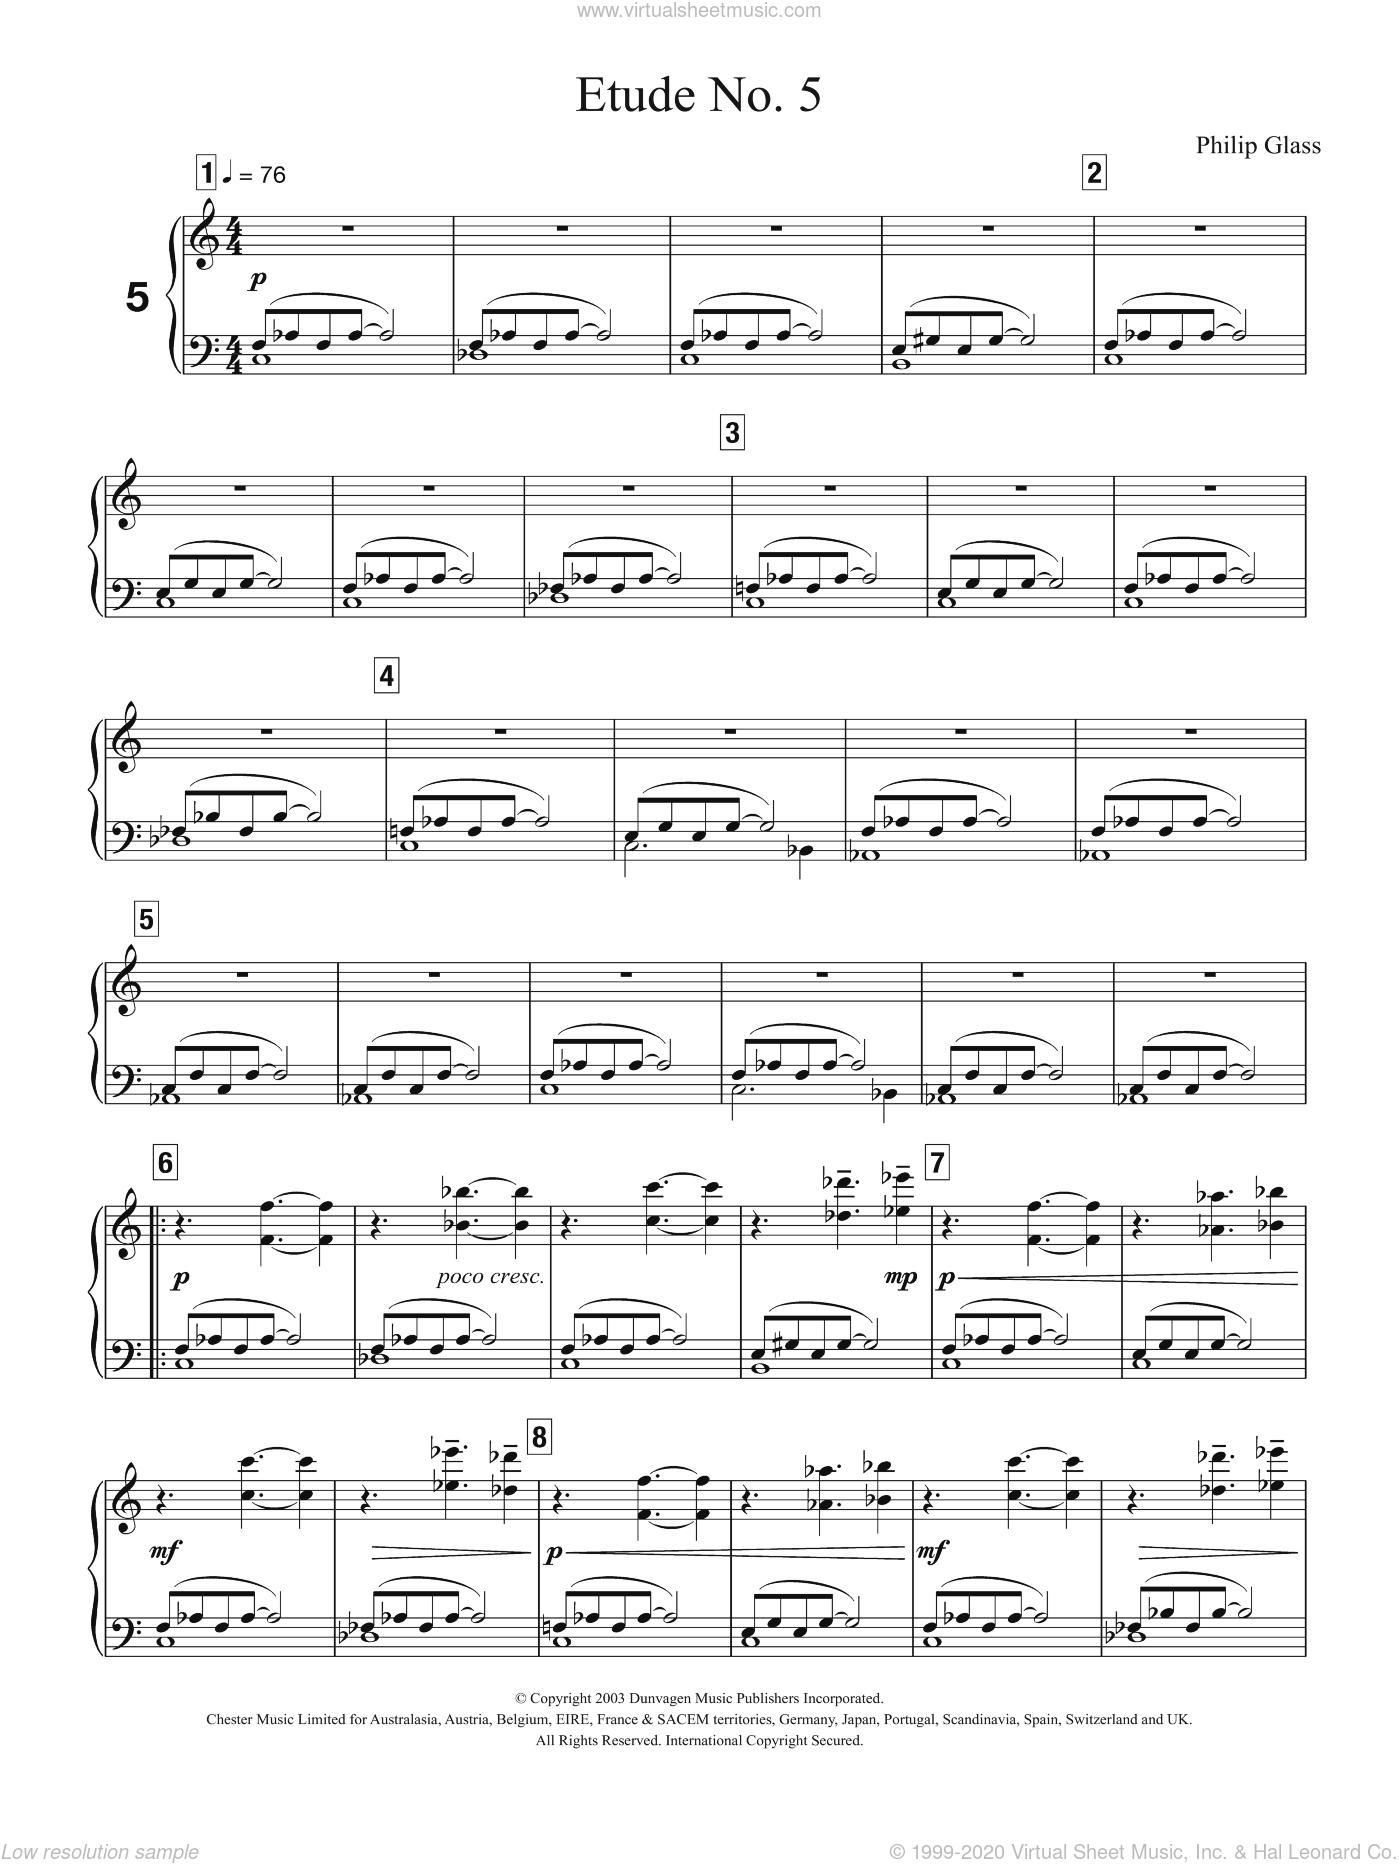 Glass Etude No 5 Sheet Music For Piano Solo Pdf